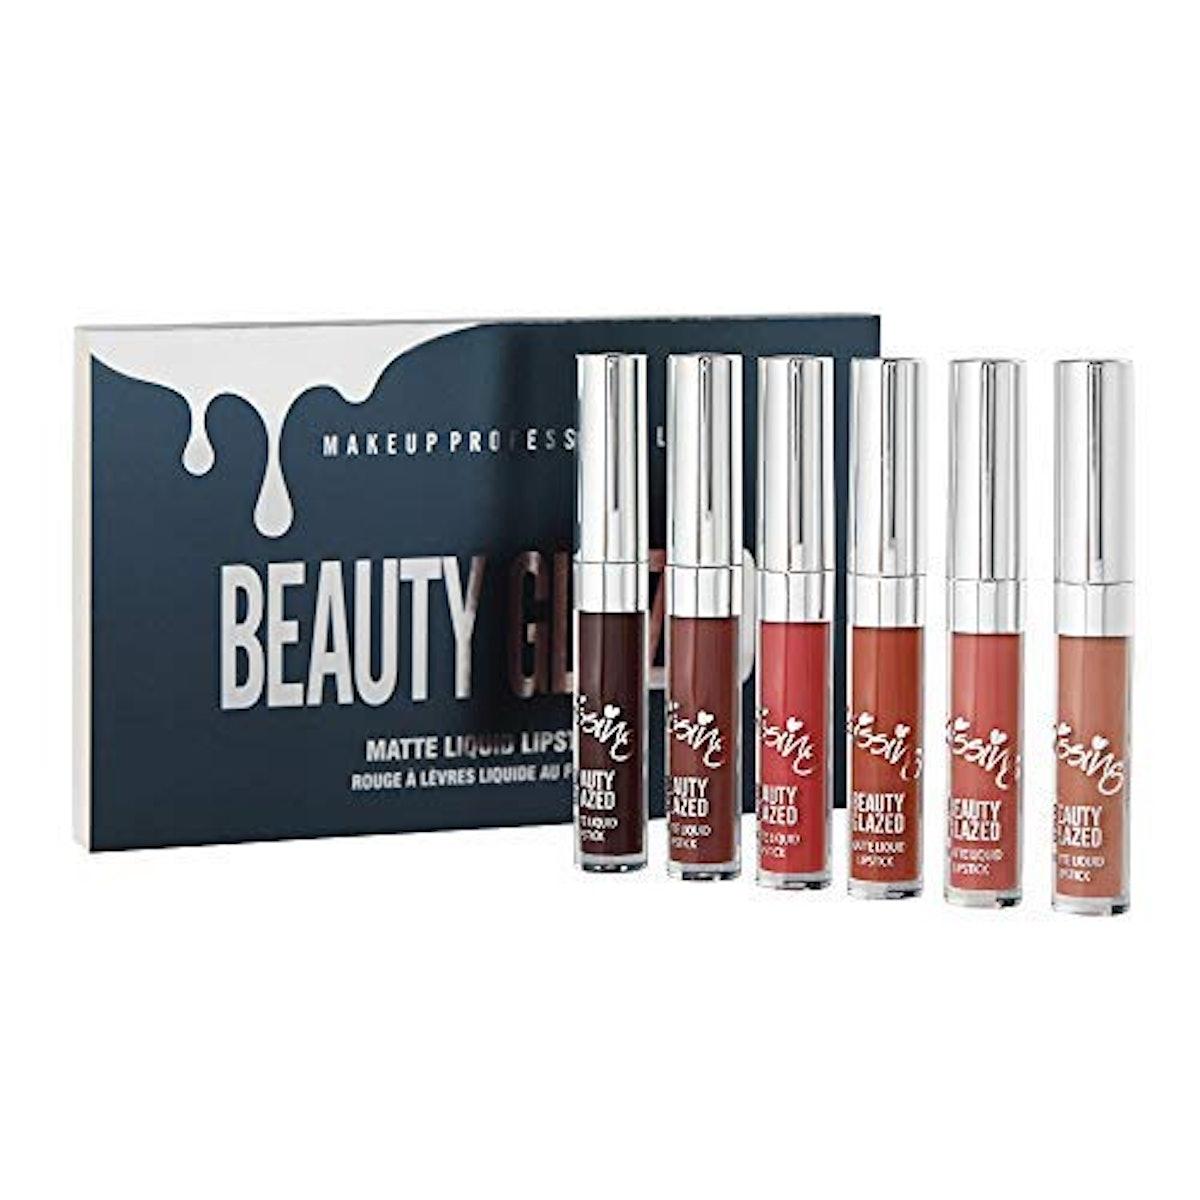 Beauty Glazed Matte Liquid Waterproof Lipstick Set (6-Piece Set)